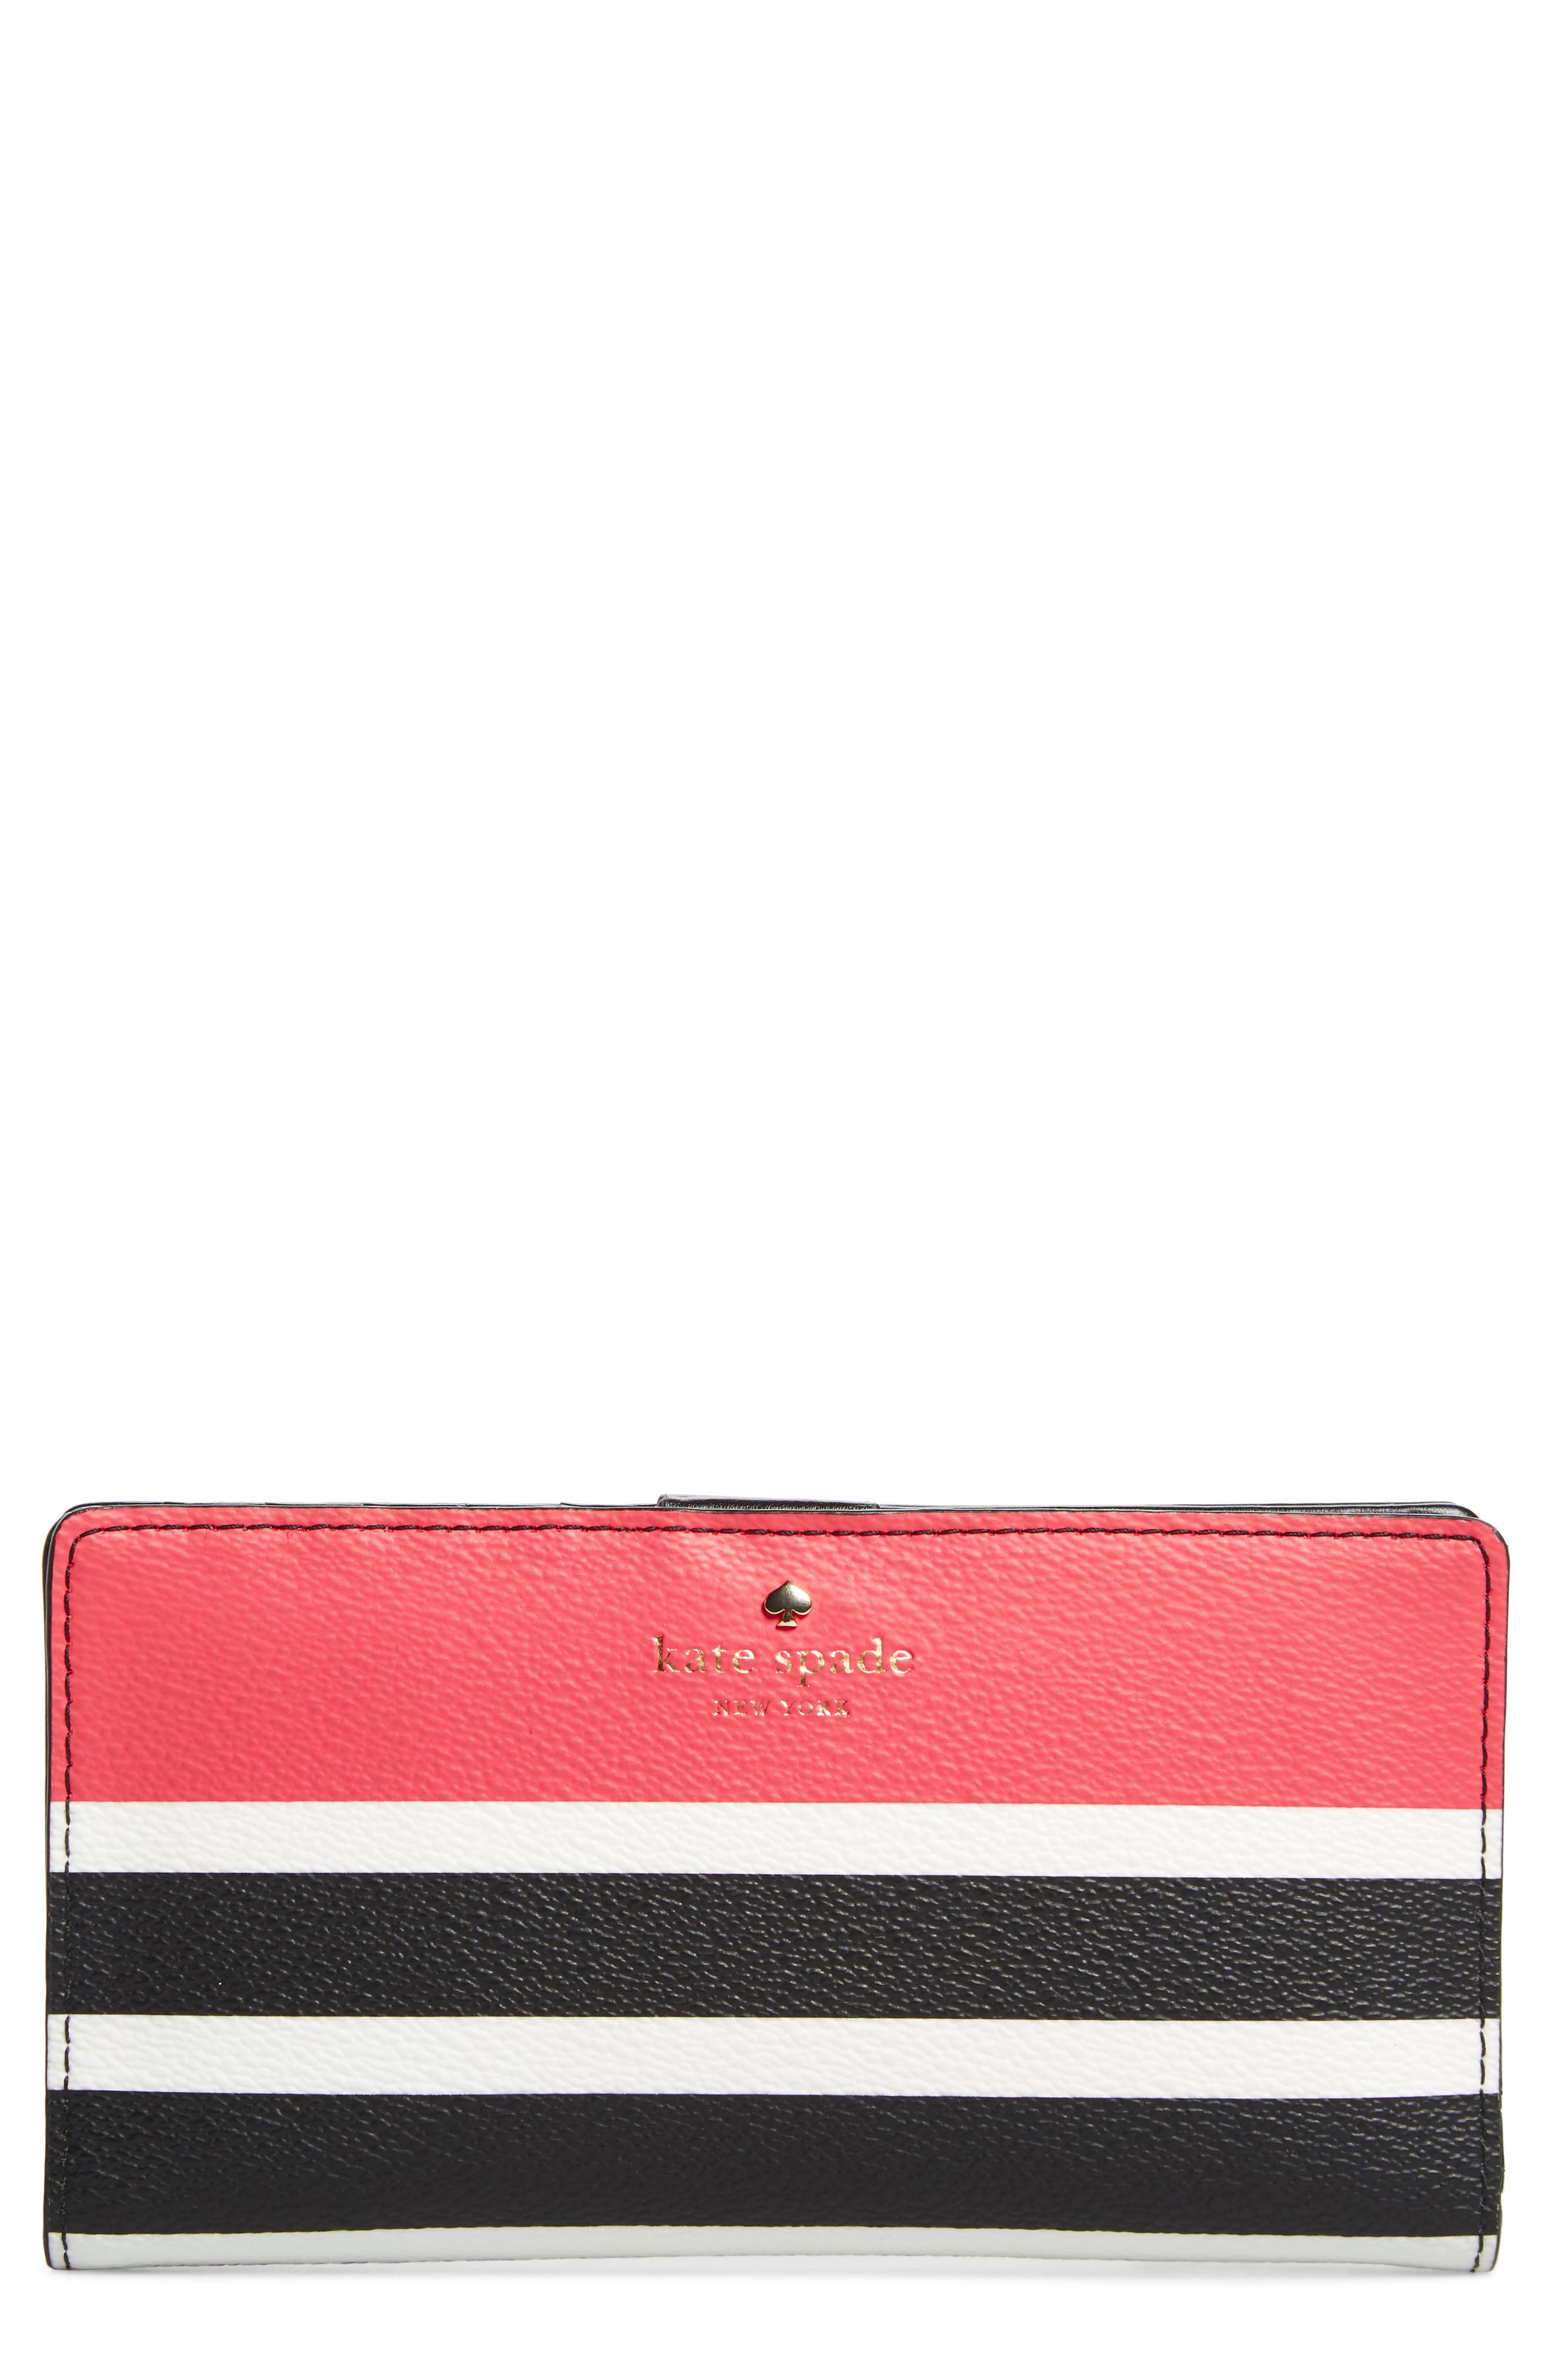 hyde lane - stripe faux leather stacy wallet,                         Main,                         color, Peach Sherbet